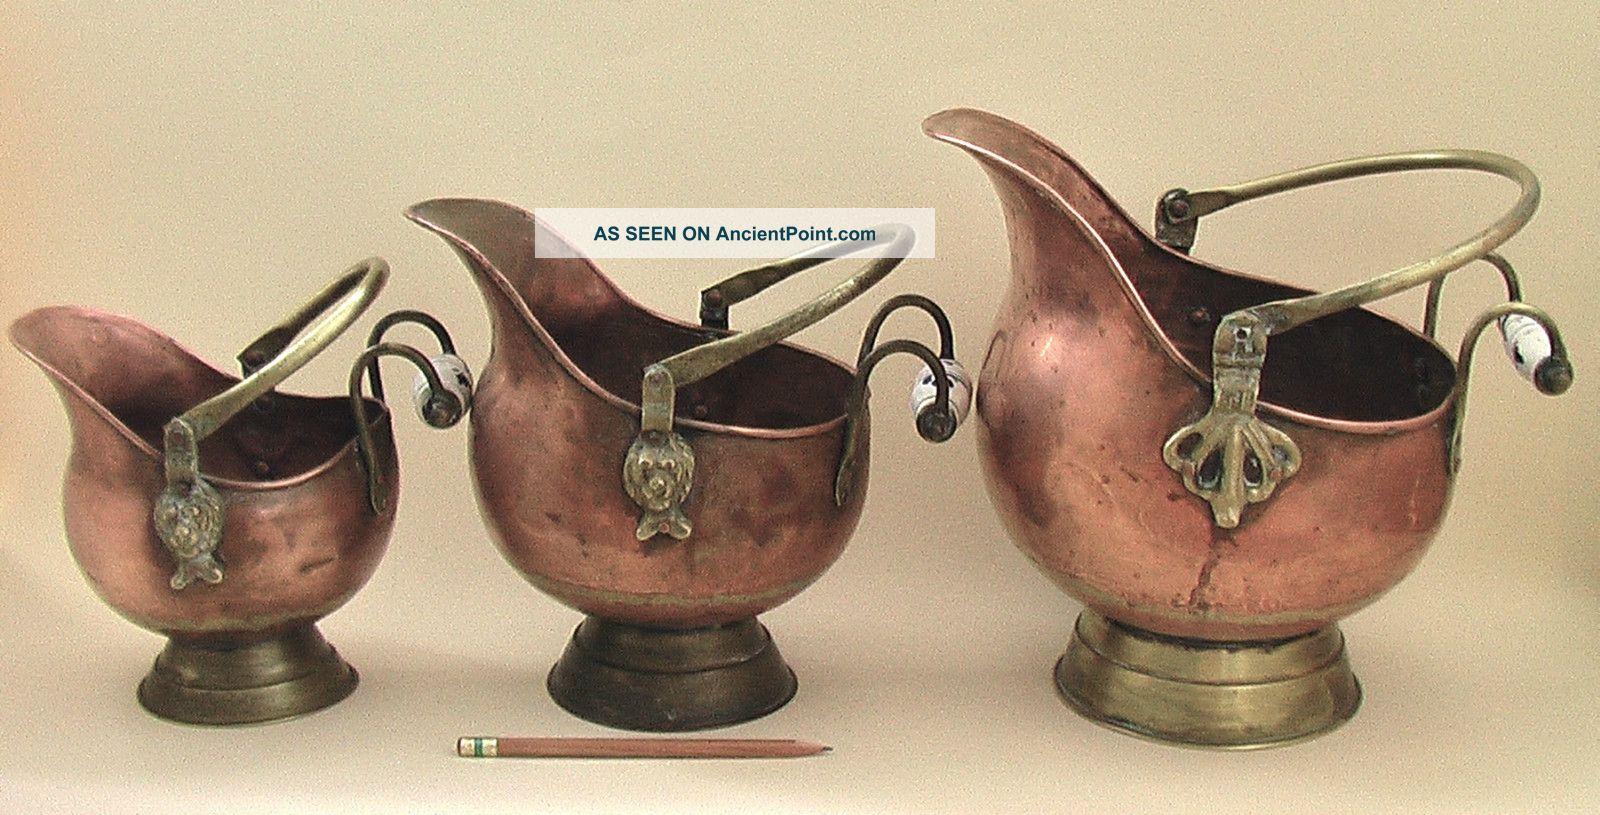 3 Vtg French Copper Coal Scuttle Delft Blue Ceramic Handle Lion Head Bucket Pail Hearth Ware photo